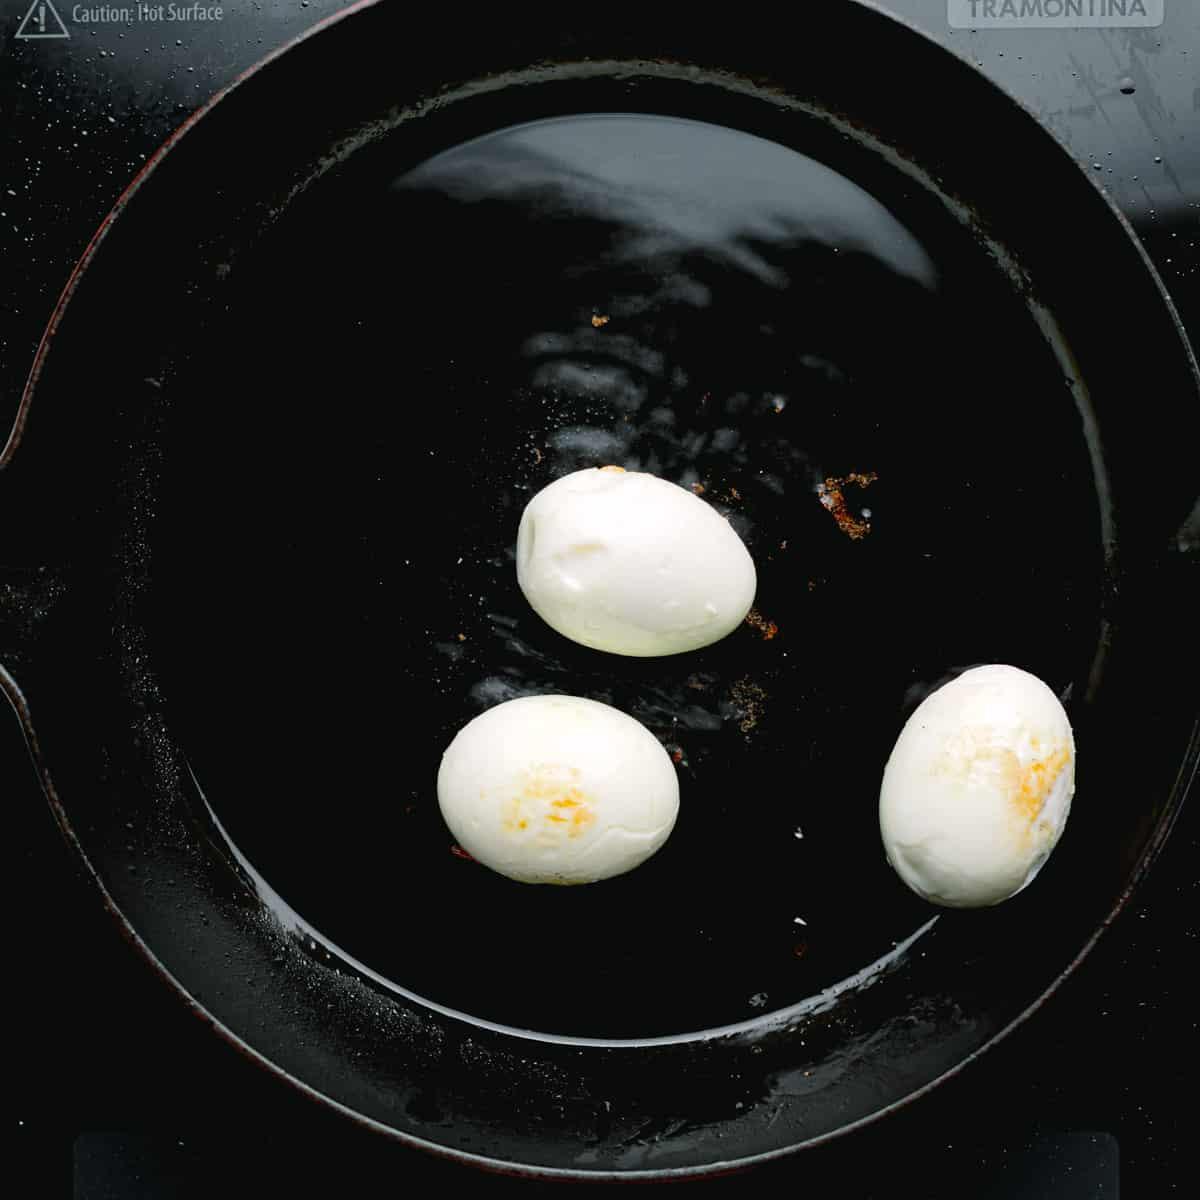 deep-fried hard-boiled eggs.